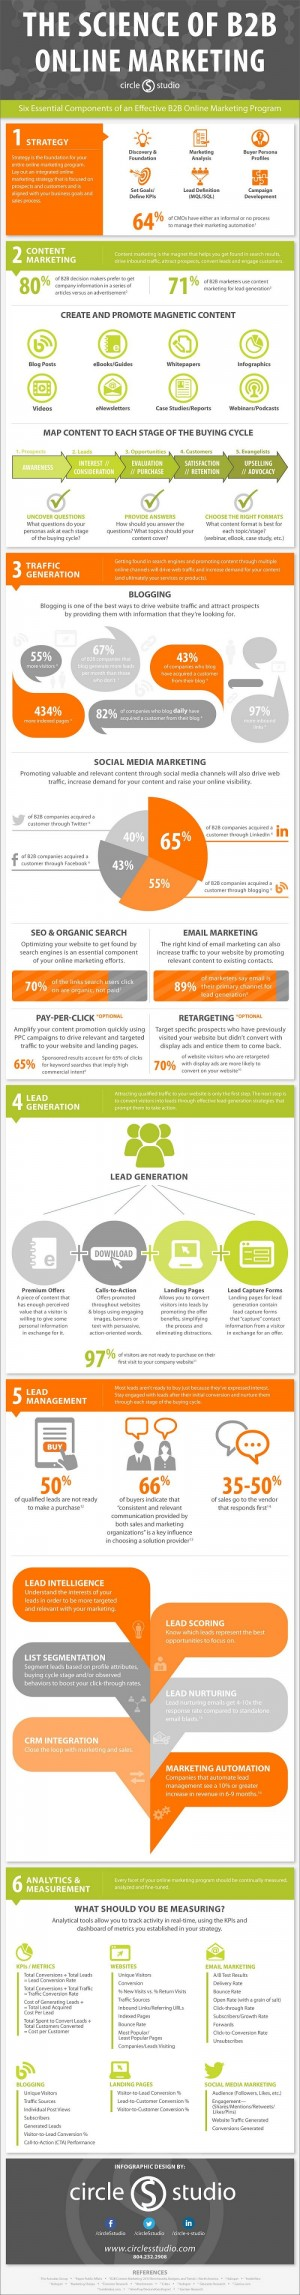 Marketing Strategy – The Science of B2B Online Marketing [Infographic] : MarketingProfs Ar ...